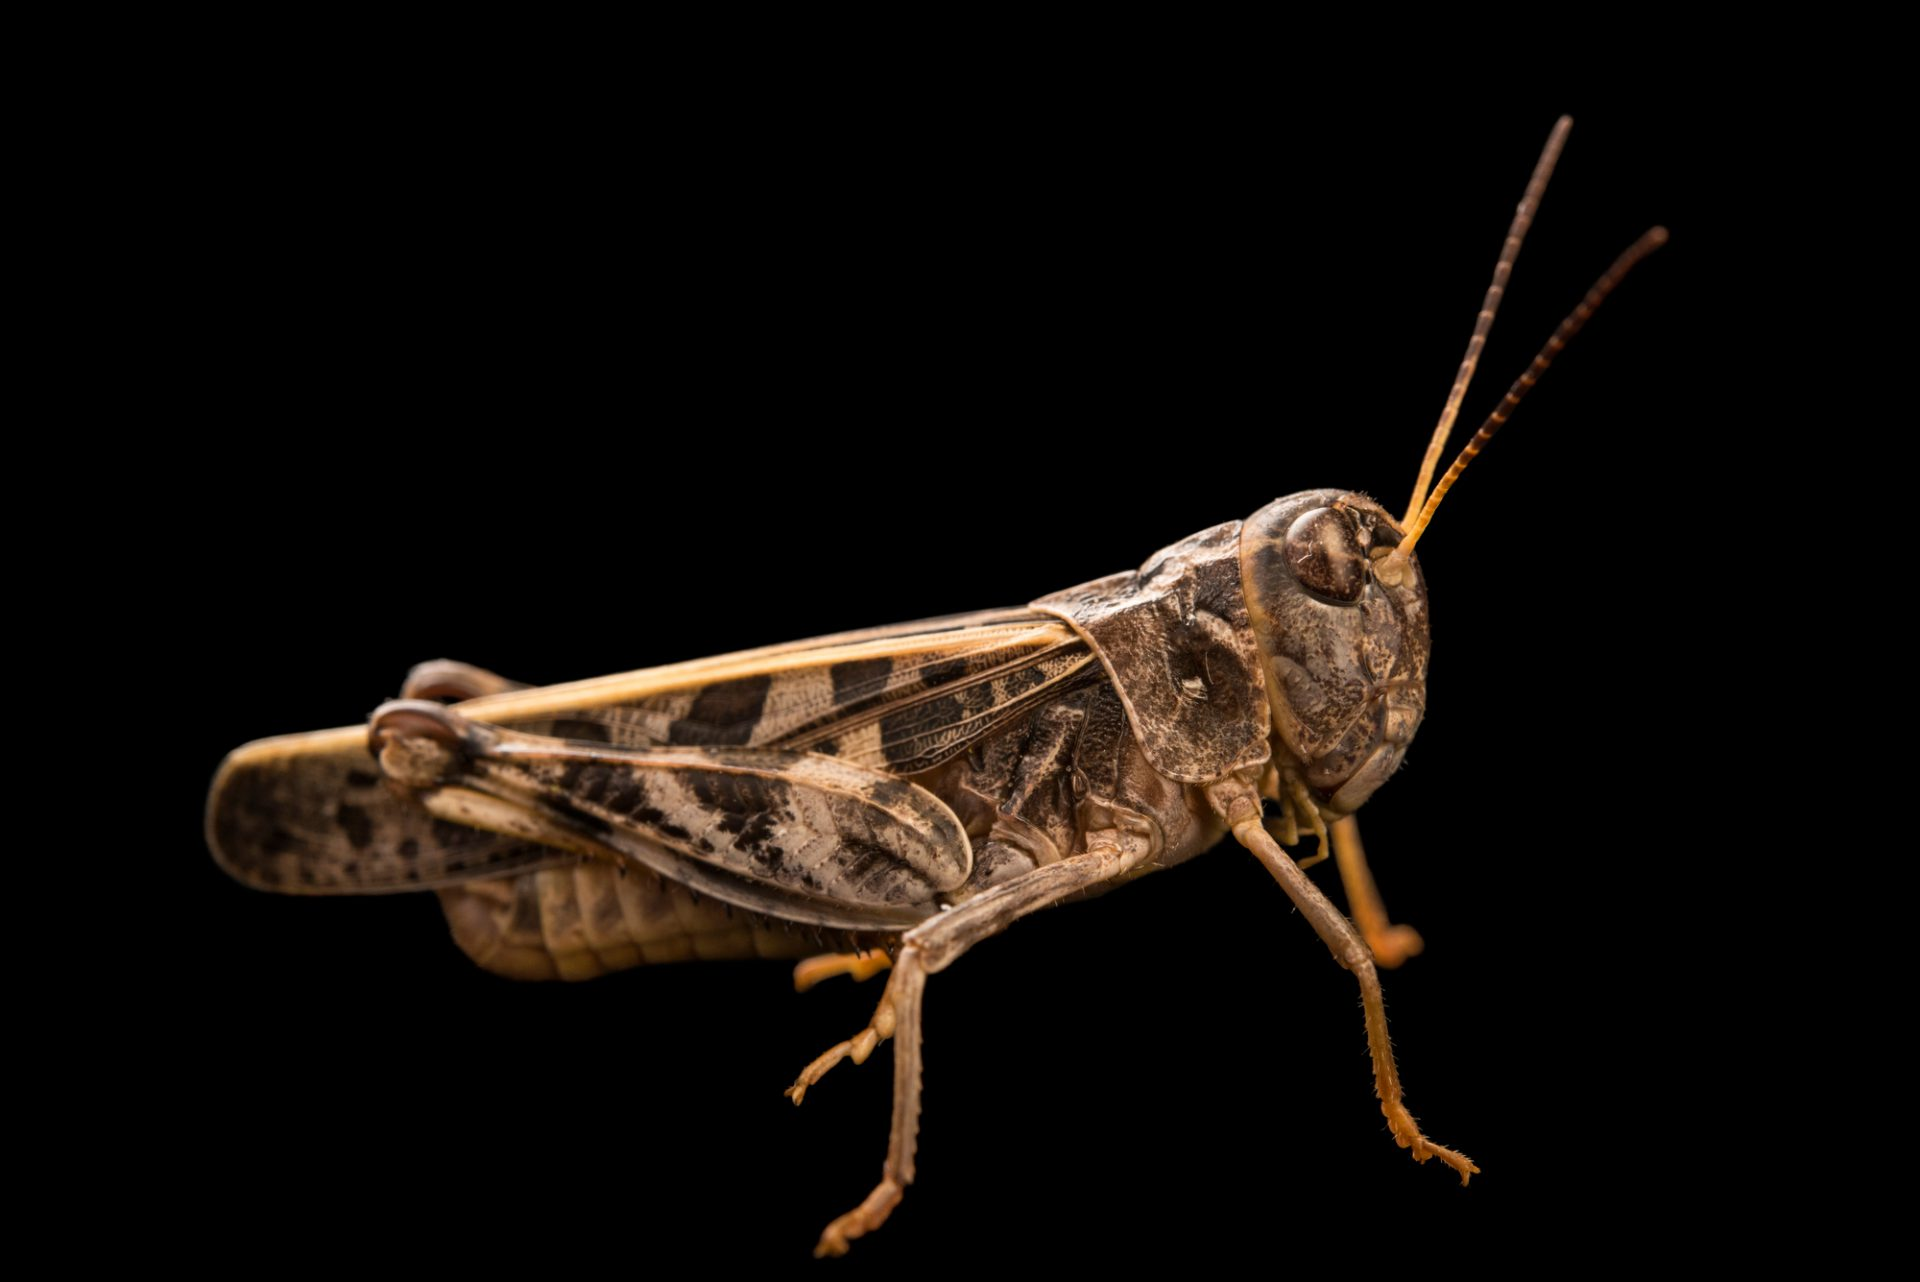 Photo: Wrinkled grasshopper (Hippiscus ocelote) at Cedar Point Biological Station.